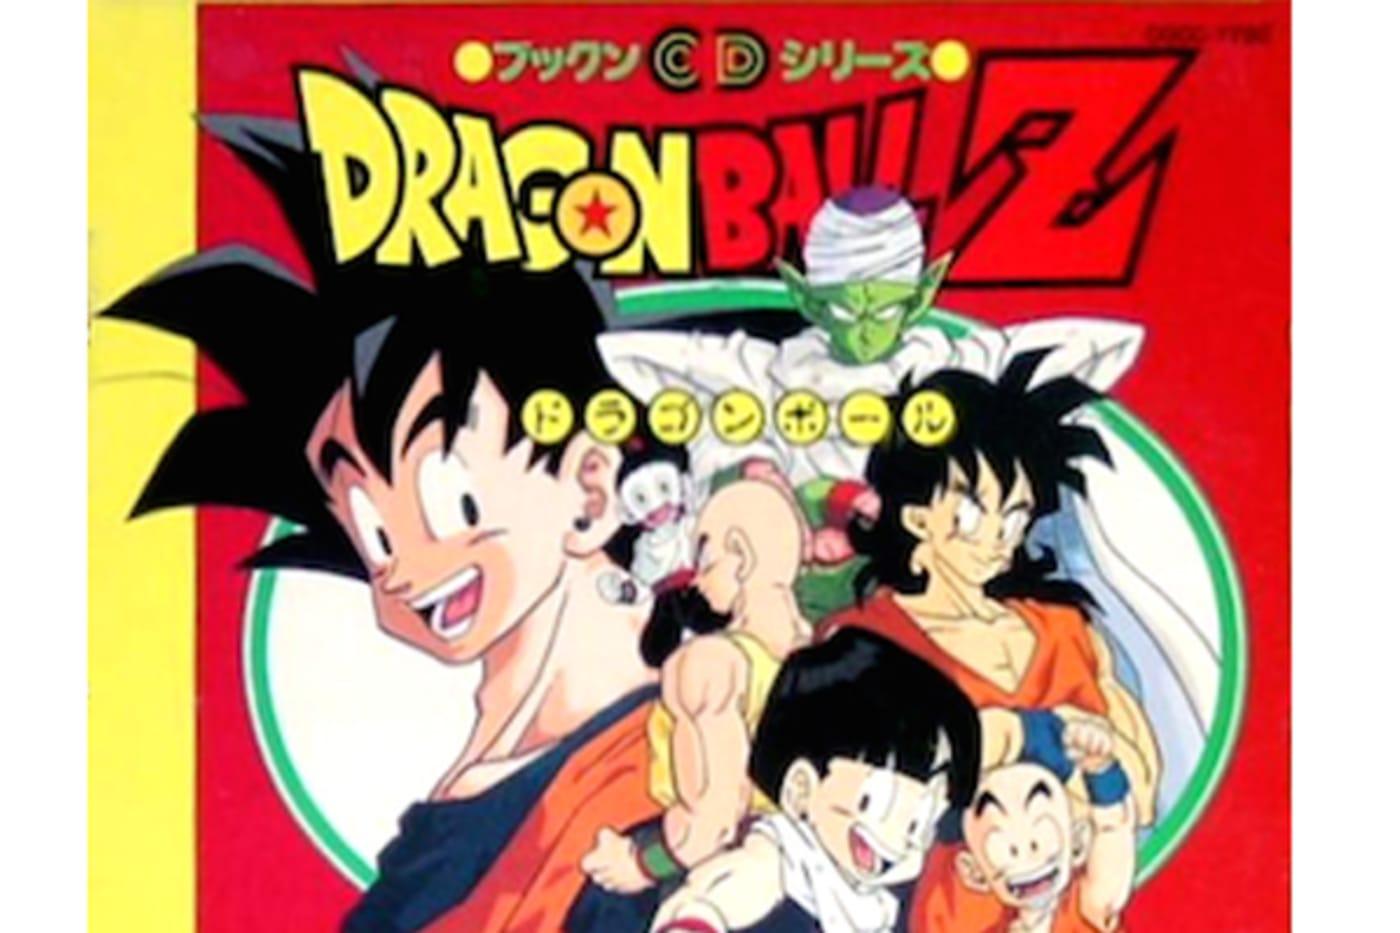 dragon ball z episodes 8